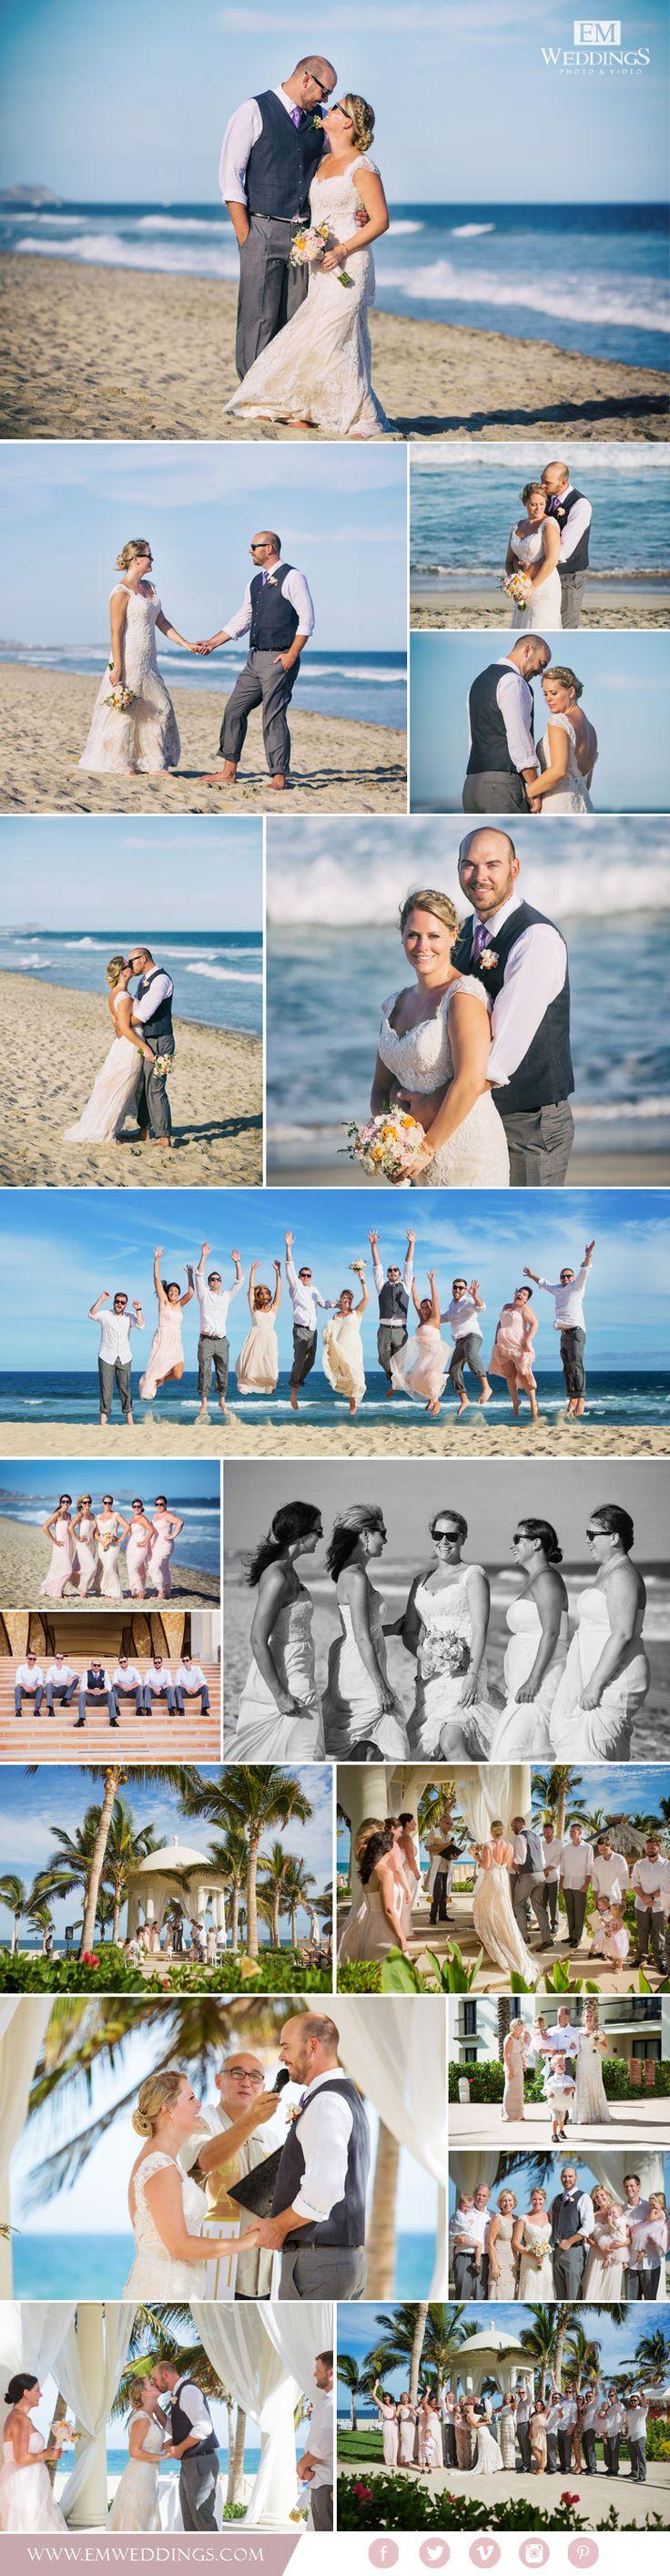 Wedding at Hyatt Ziva, Los Cabos, México - Los Cabos Wedding Photographer. #emweddingsphotography #destinationweddings